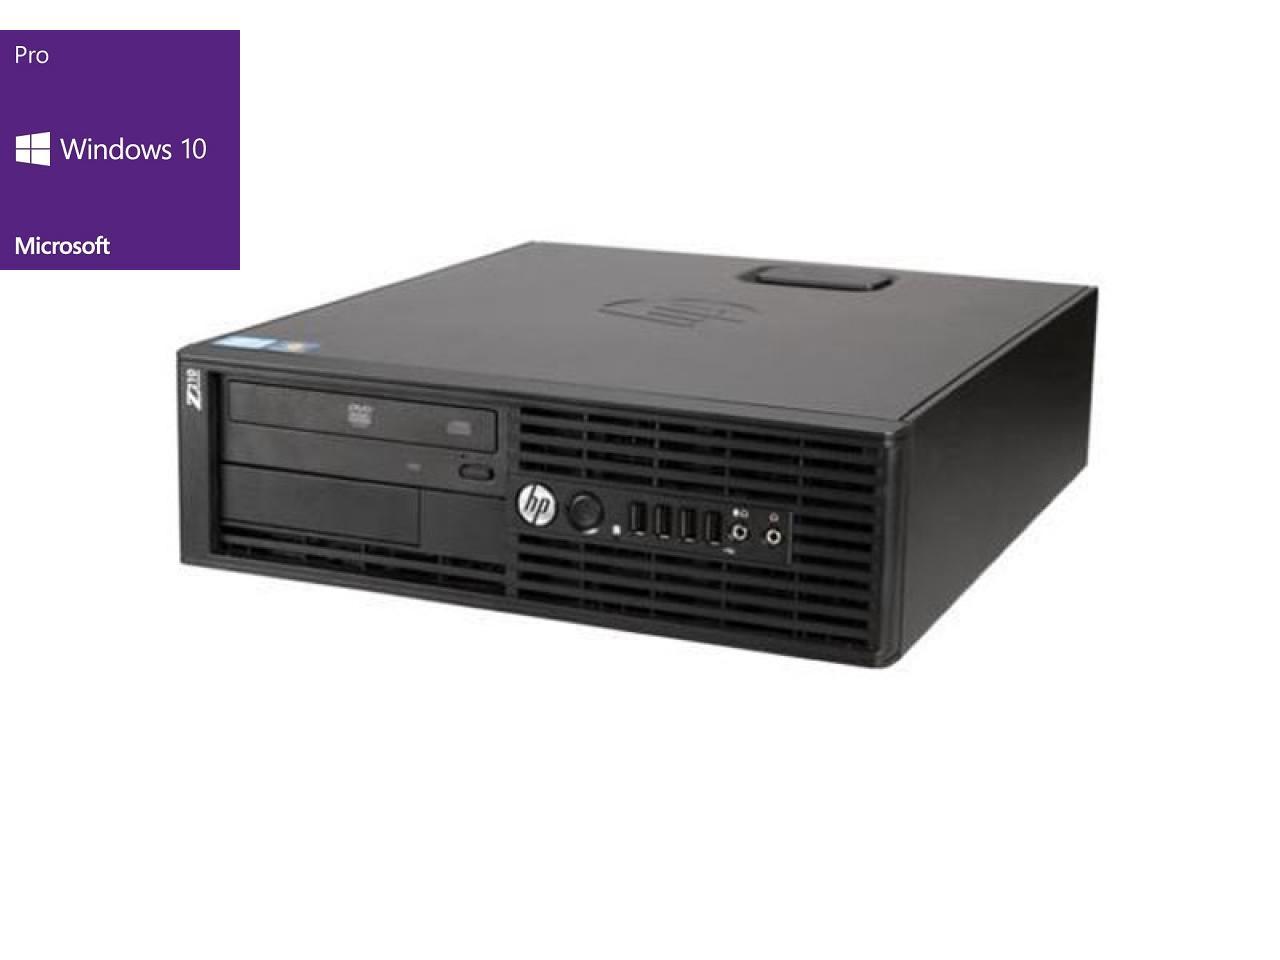 Hewlett Packard Z210 SFF